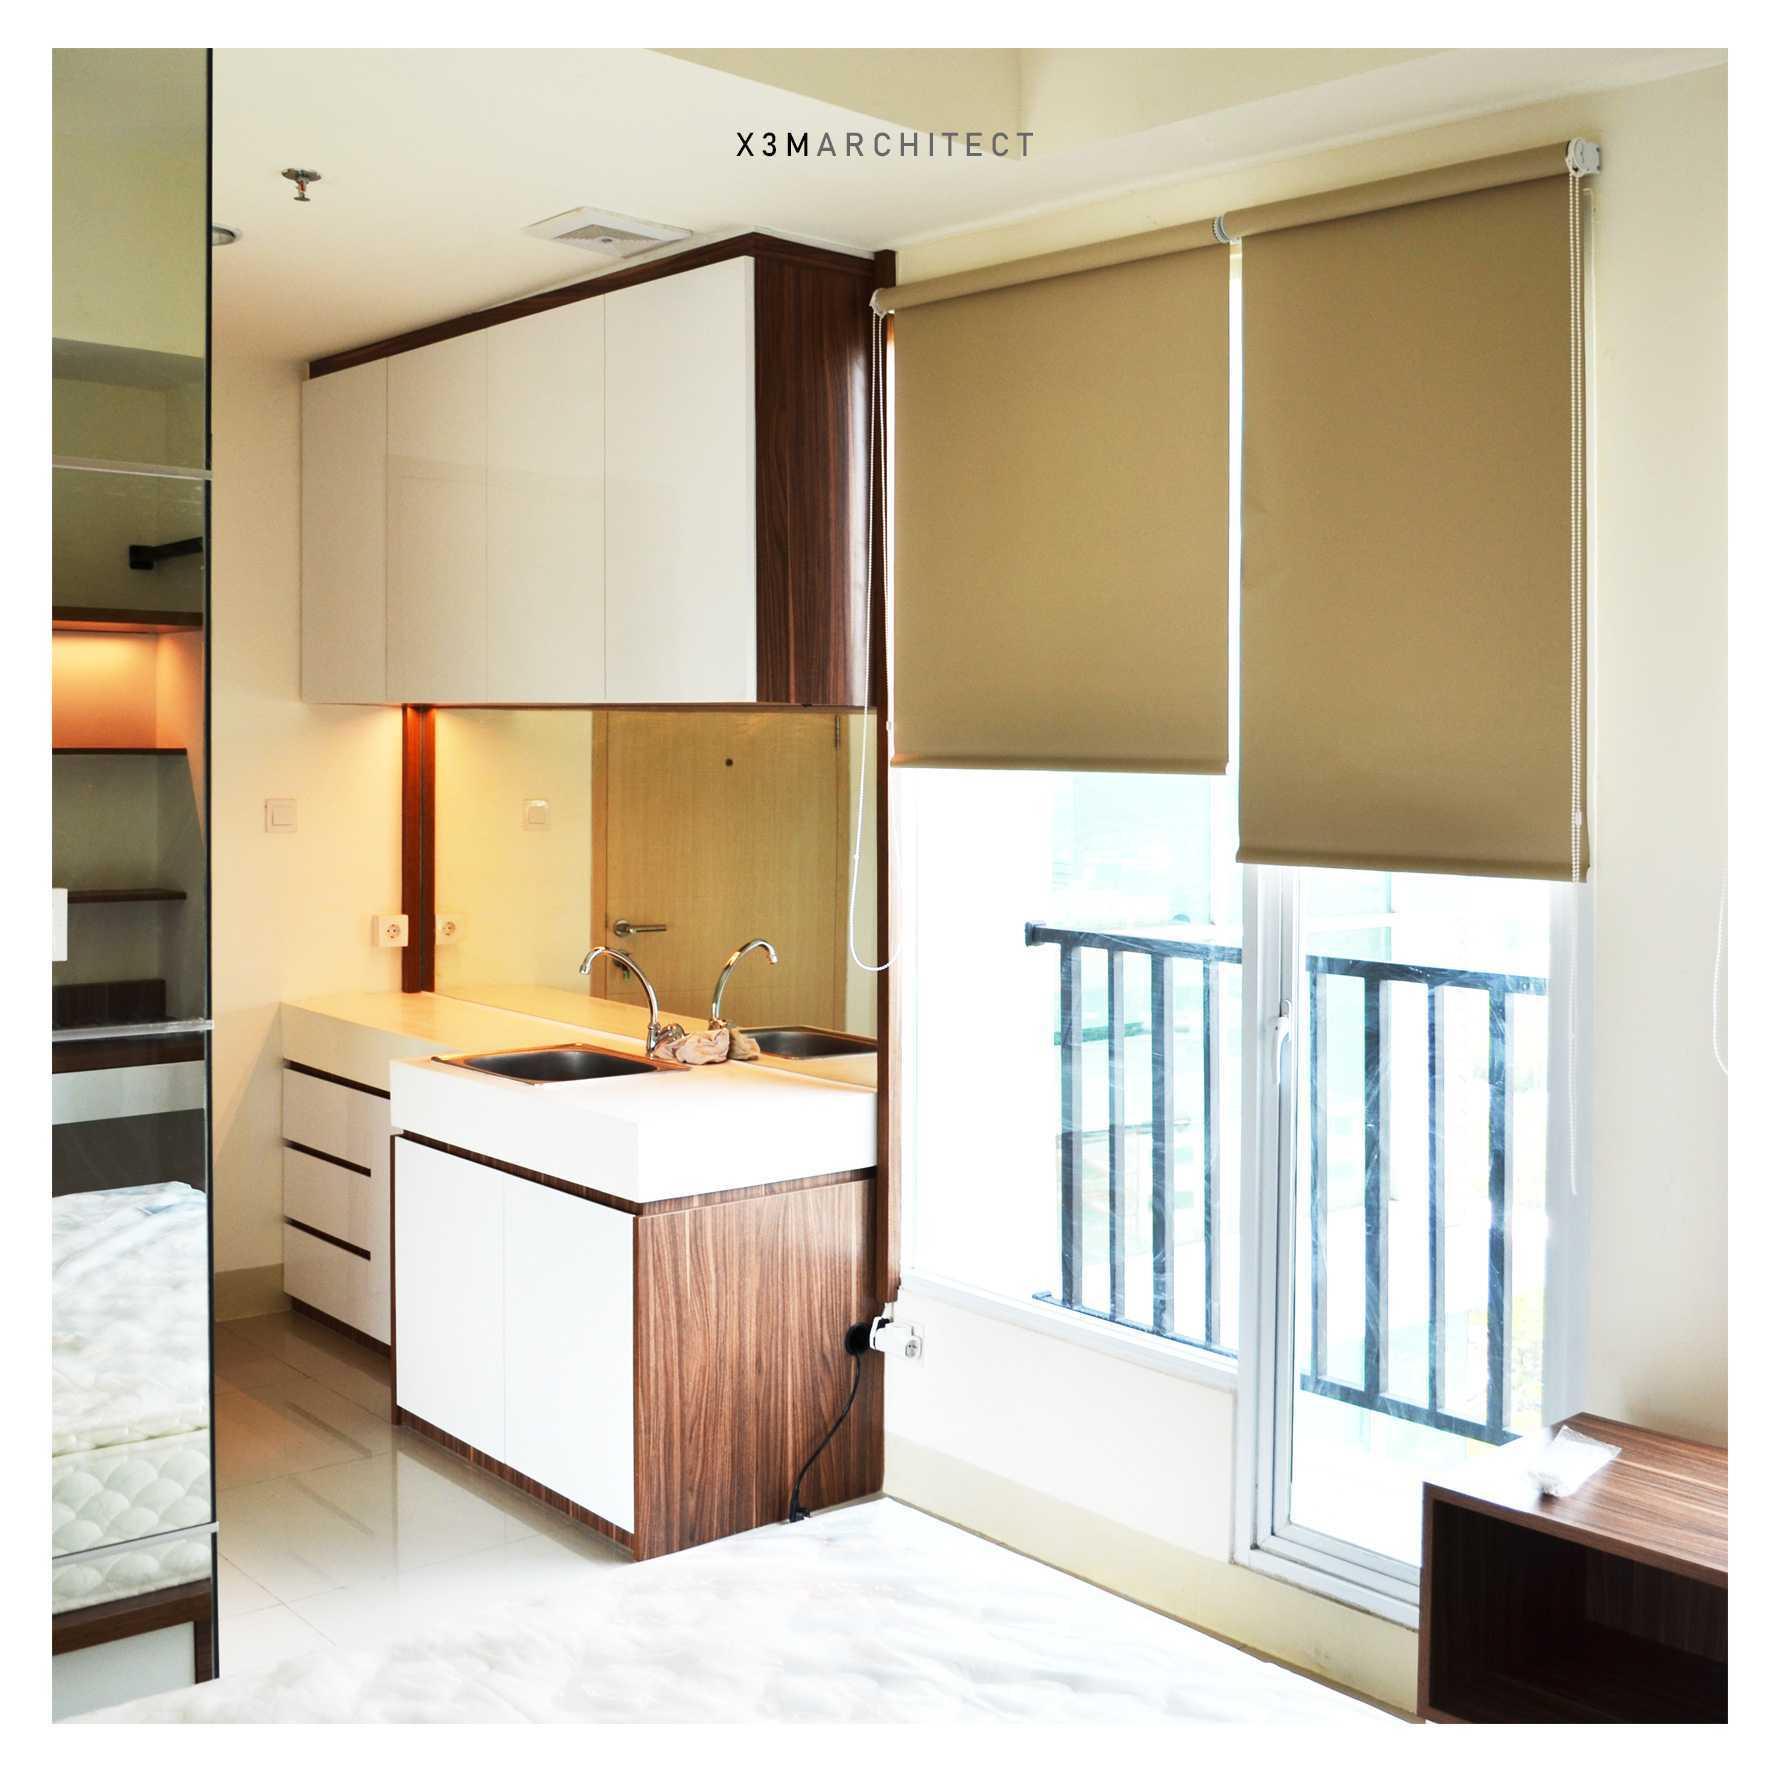 X3M Architects Apartment Tree Park, Bsd Sunburst Cbd Lot Ii/17 (Ruko C-07), Bsd, Tangerang Selatan Serpong, Lengkong Wetan, Serpong, Kota Tangerang Selatan, Banten 15310, Indonesia Sunburst Cbd Lot Ii/17 (Ruko C-07), Bsd, Tangerang Selatan Serpong, Lengkong Wetan, Serpong, Kota Tangerang Selatan, Banten 15310, Indonesia X3M-Architects-Apartment-Tree-Park-Bsd  76015